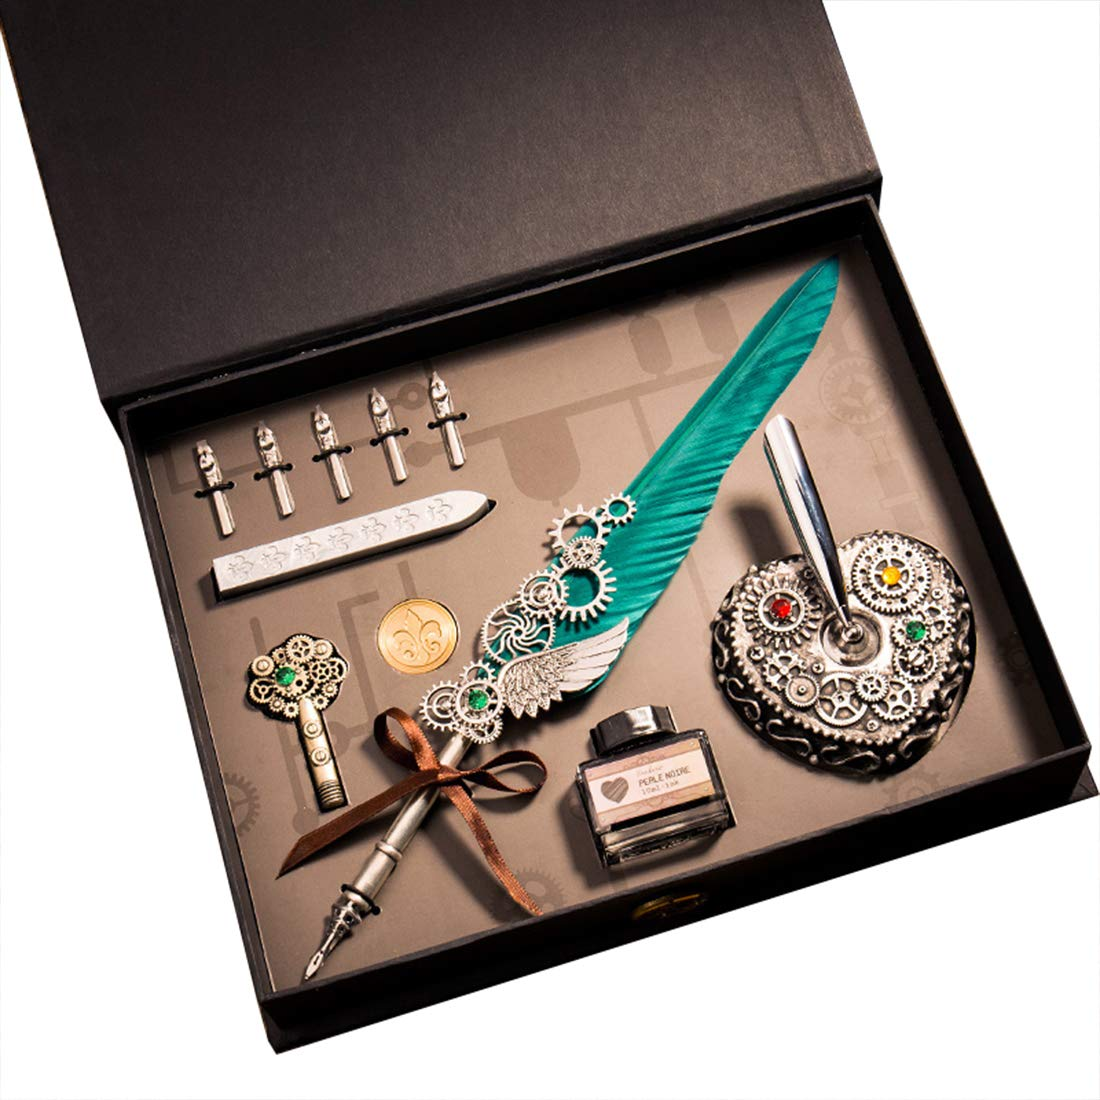 HENHEN Steampunk Calligraphy Pen Set, Mechanical Gear Decorated Quill Feather Pen + Ink + 5 Extra Nibs + Pen Holder + Brass Stamp + Sealing Wax Set, Artist Lettering, in Gift Box by HENHEN